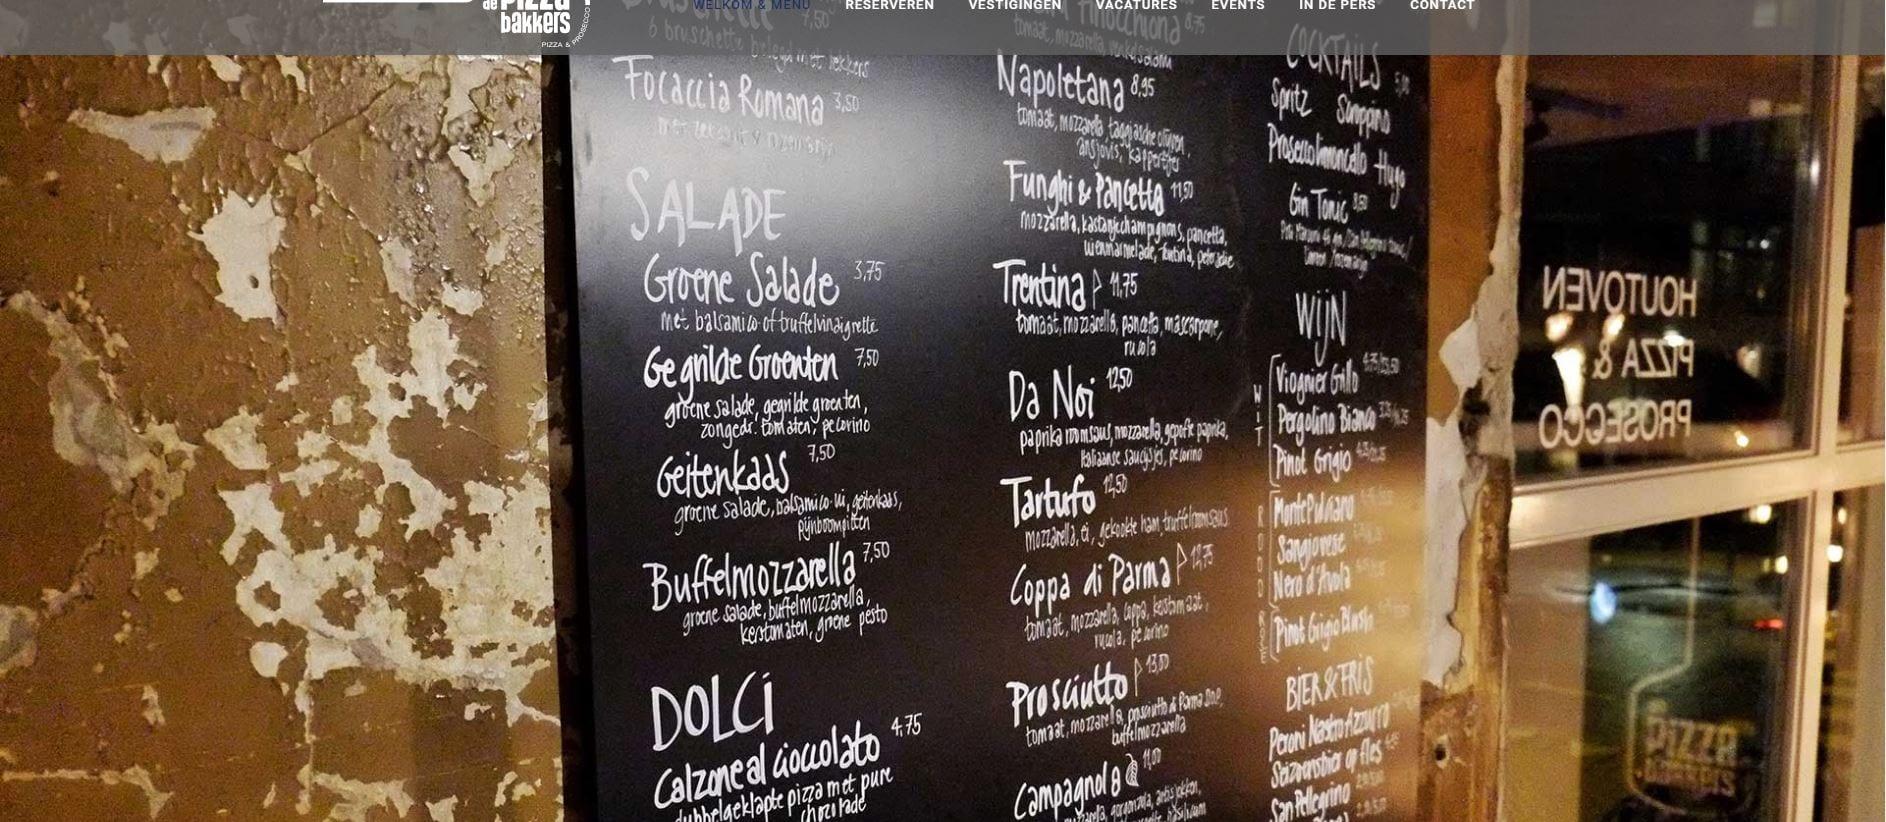 De Pizzabakkers - menukaart